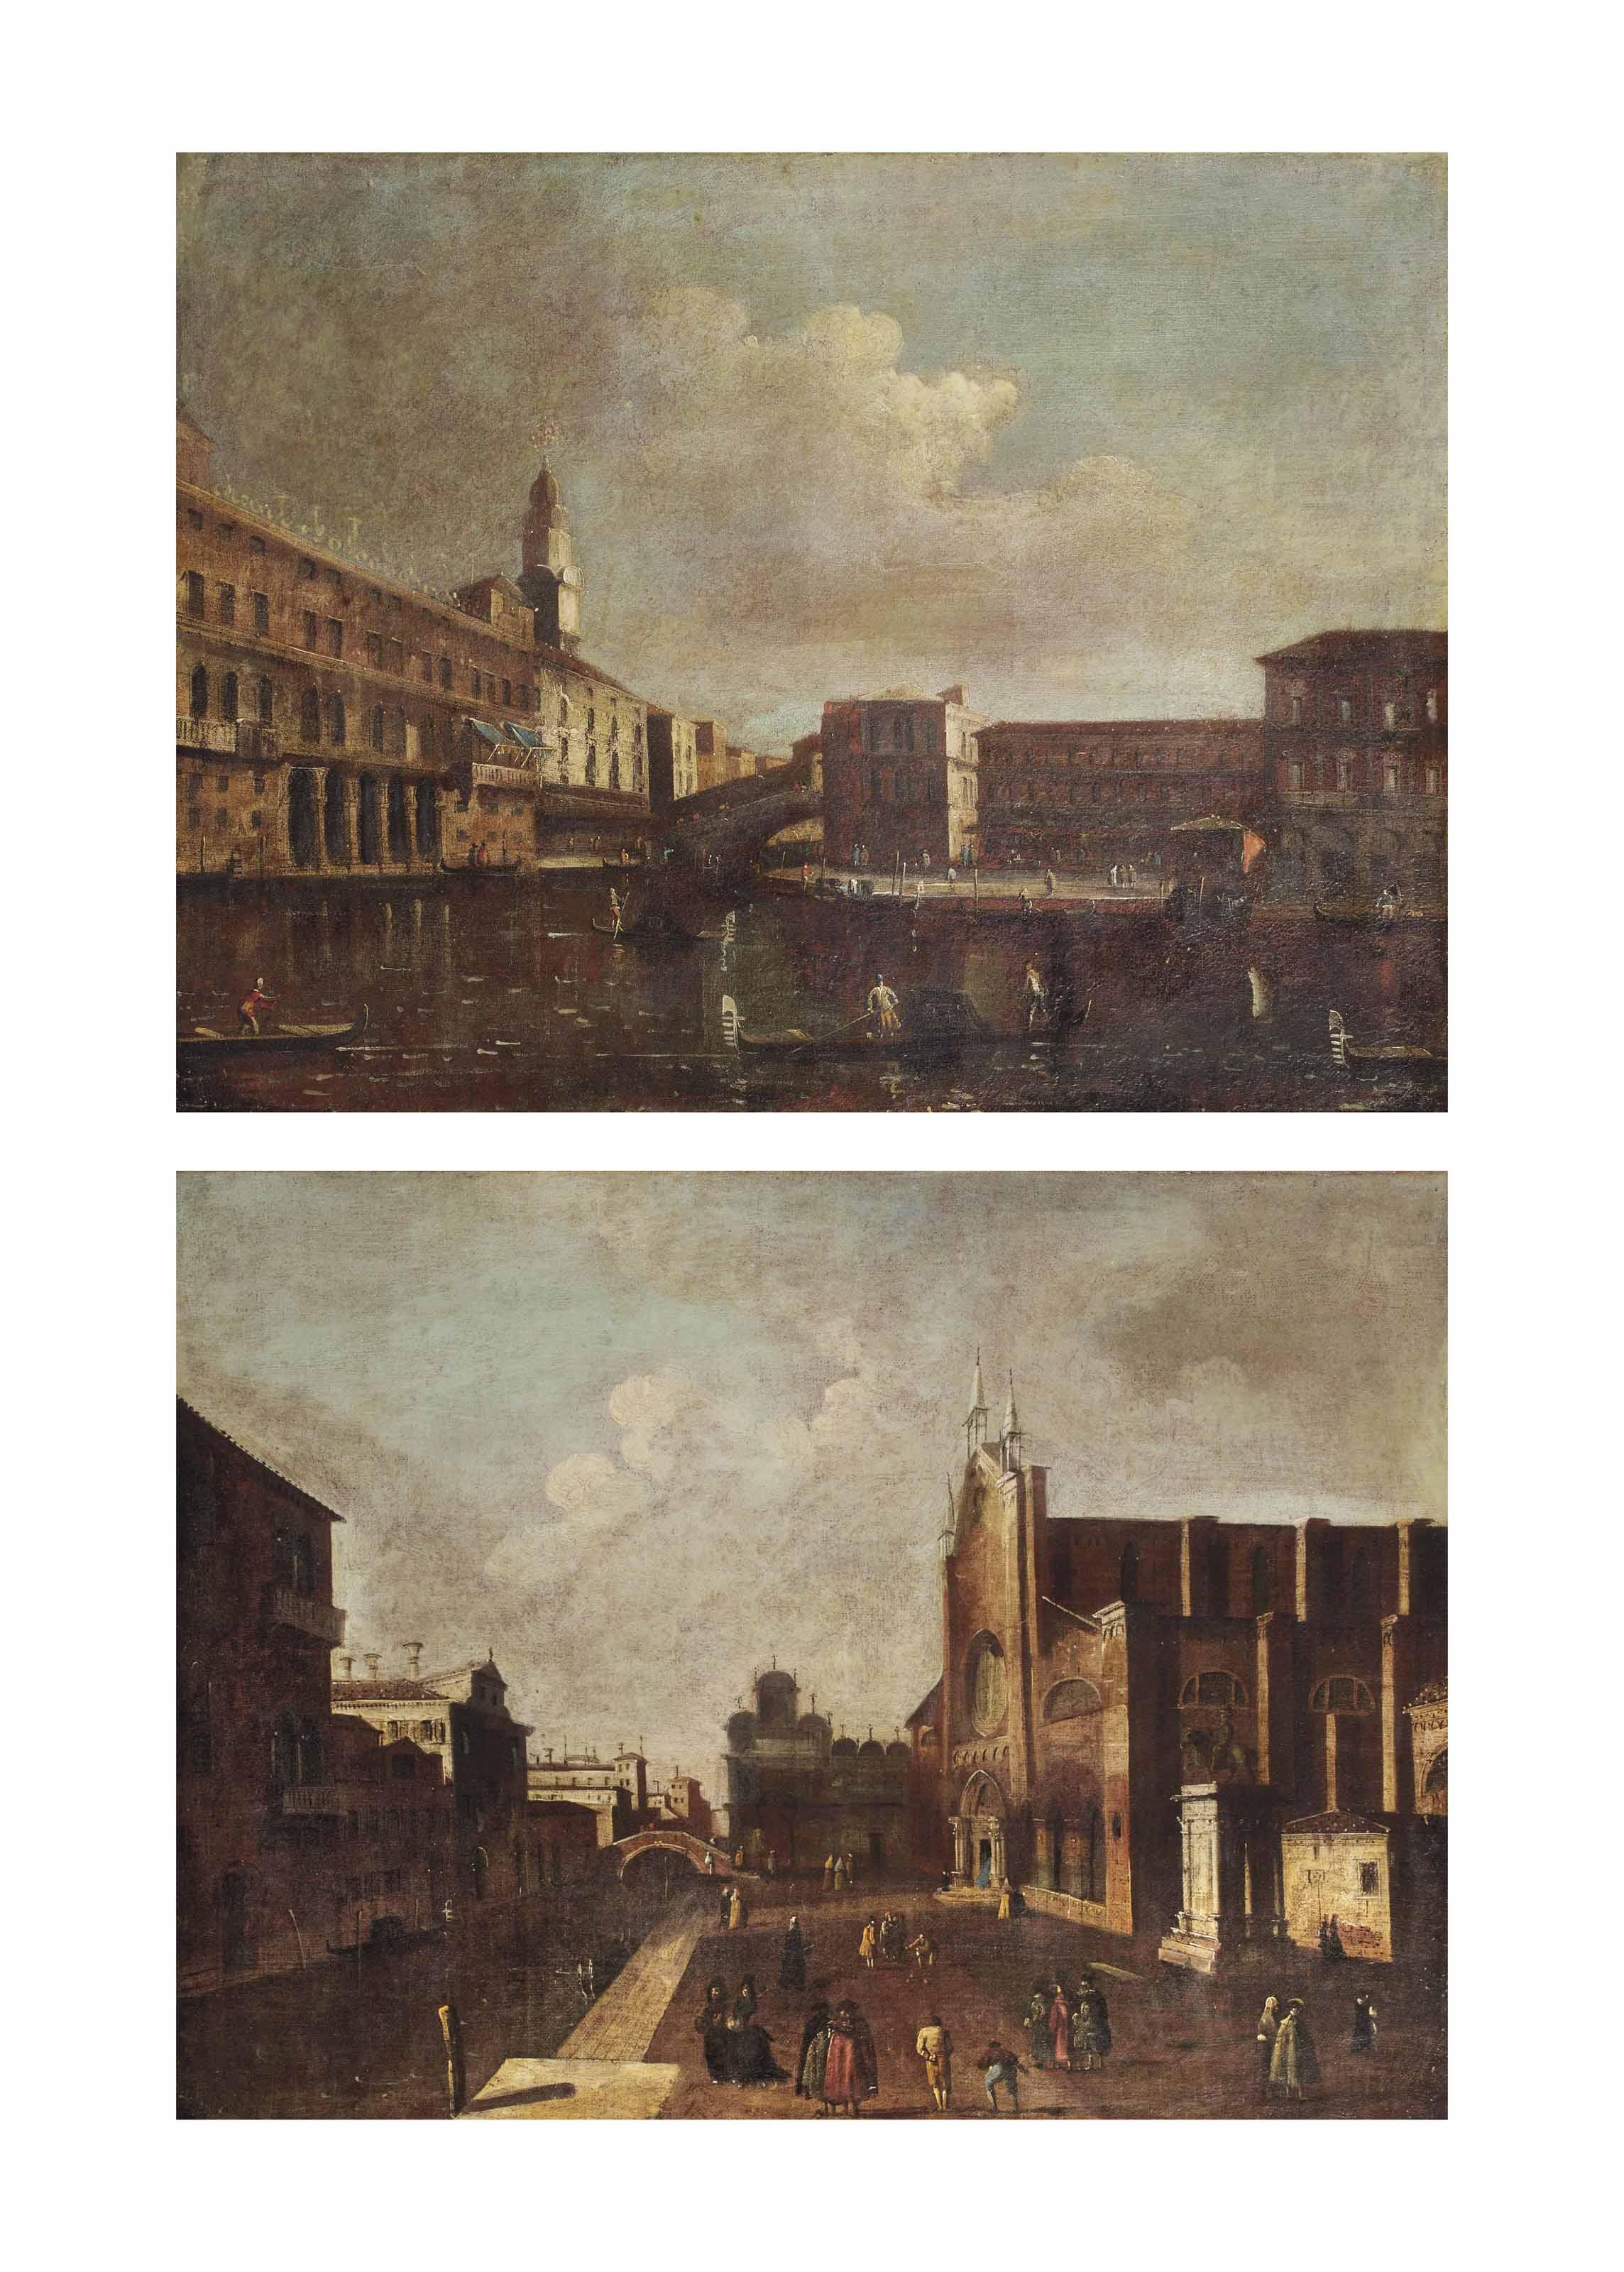 A view of the Grand Canal, Venice, with the Fondaco dei Tedeschi and the Rialto bridge; and a view of the Campo Santi Giovanni e Paolo, Venice, looking on the Scuola di San Marco and the Chiesa Santa Maria dei Frari